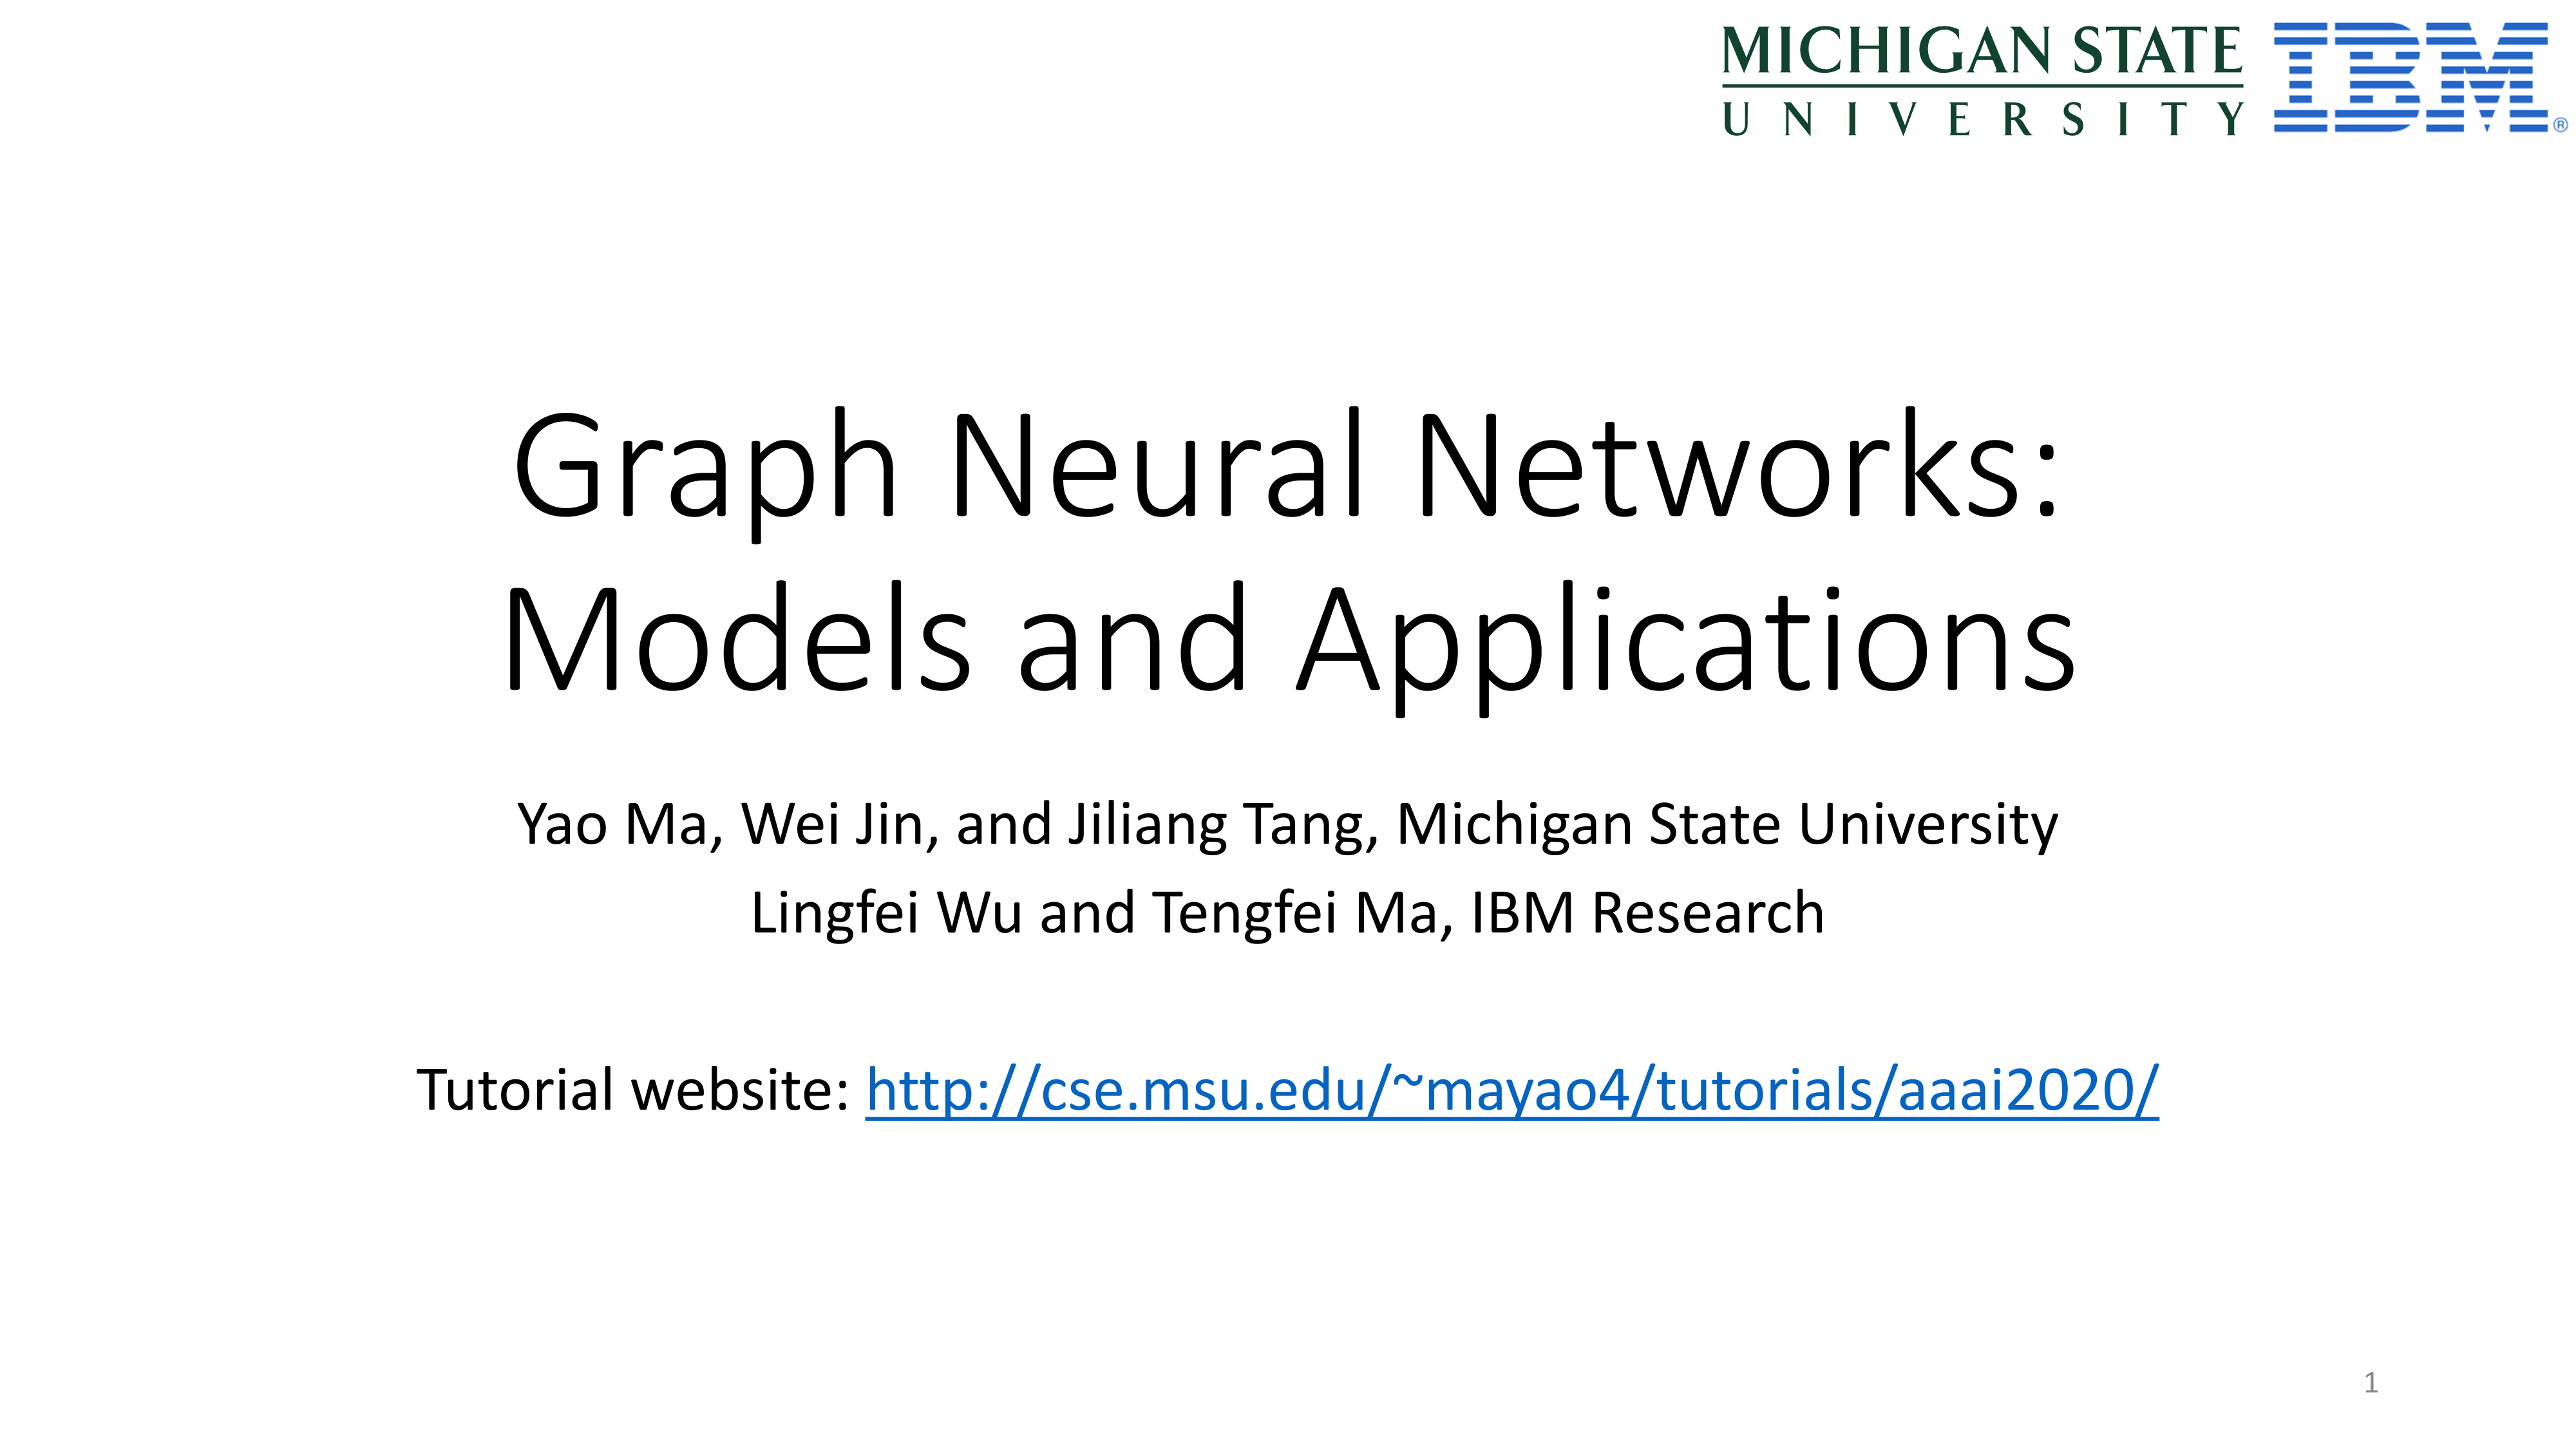 AAAI2020最新「图神经网络GNN模型与应用」305页ppt,密歇根州立大学